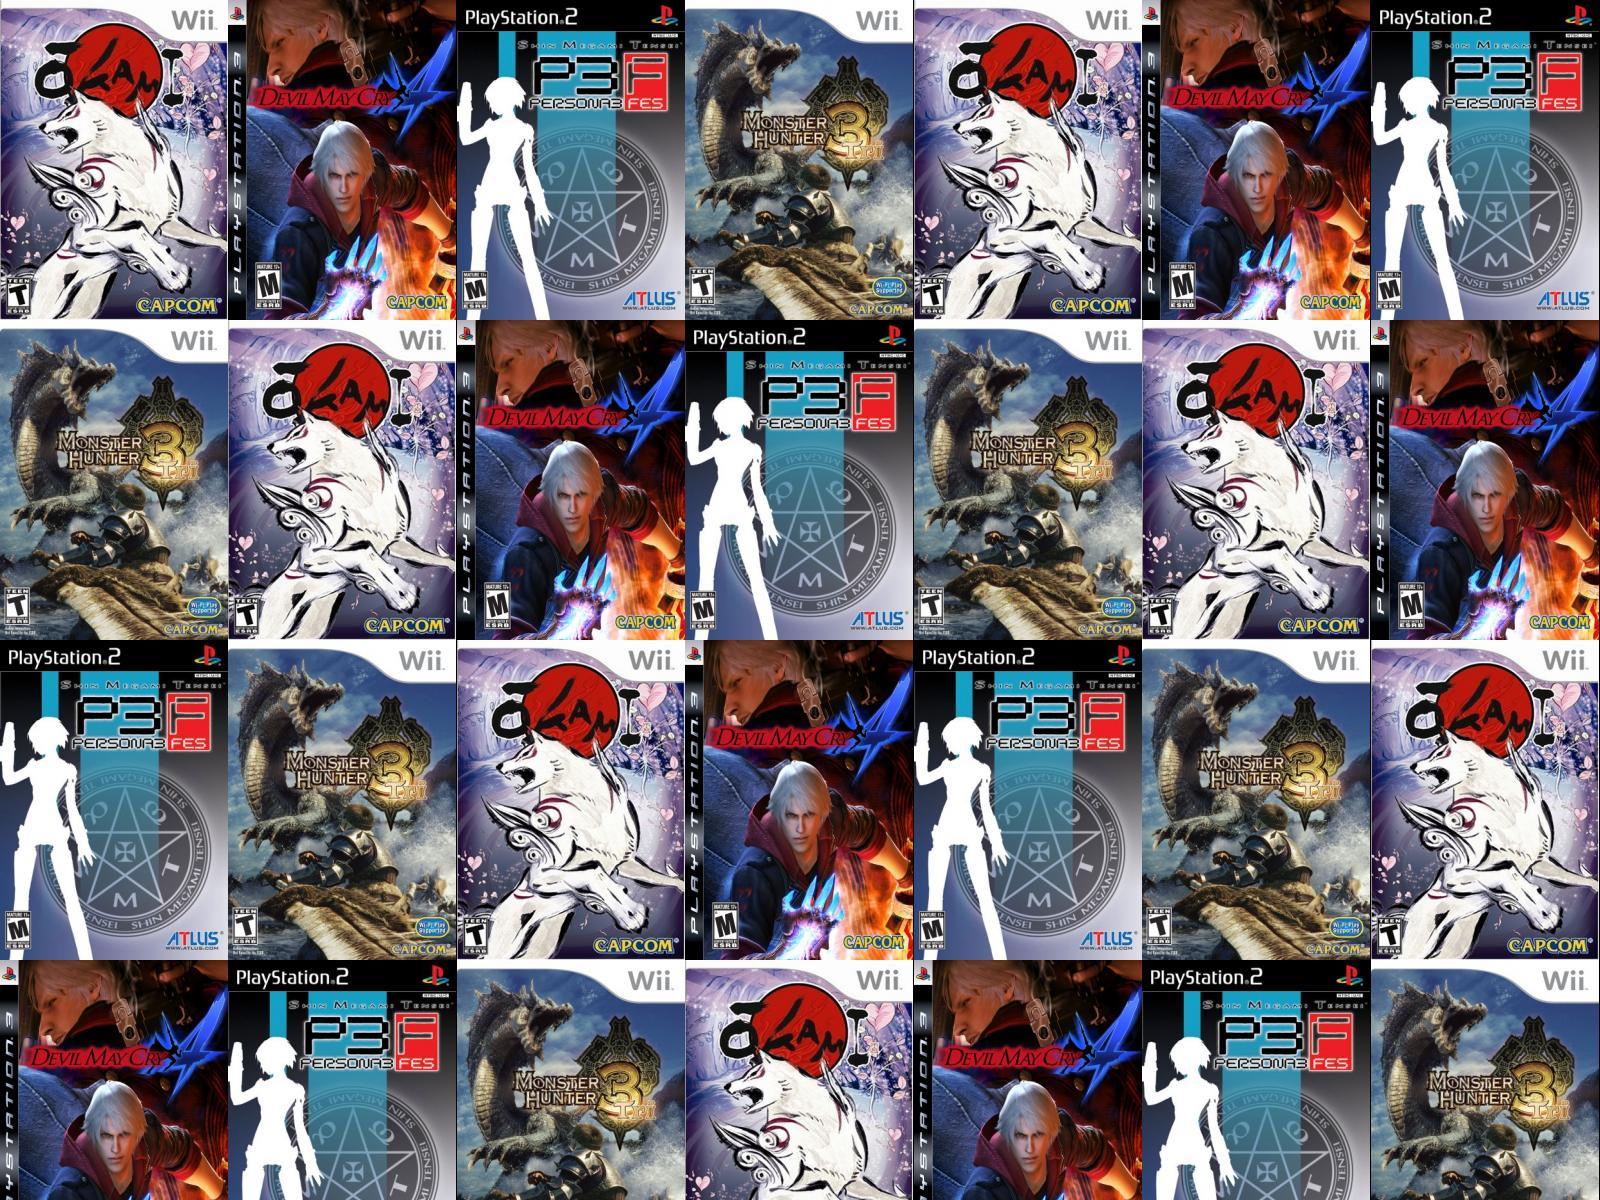 Okami Devil May Cry 4 Persona 3 Fes Wallpaper Tiled